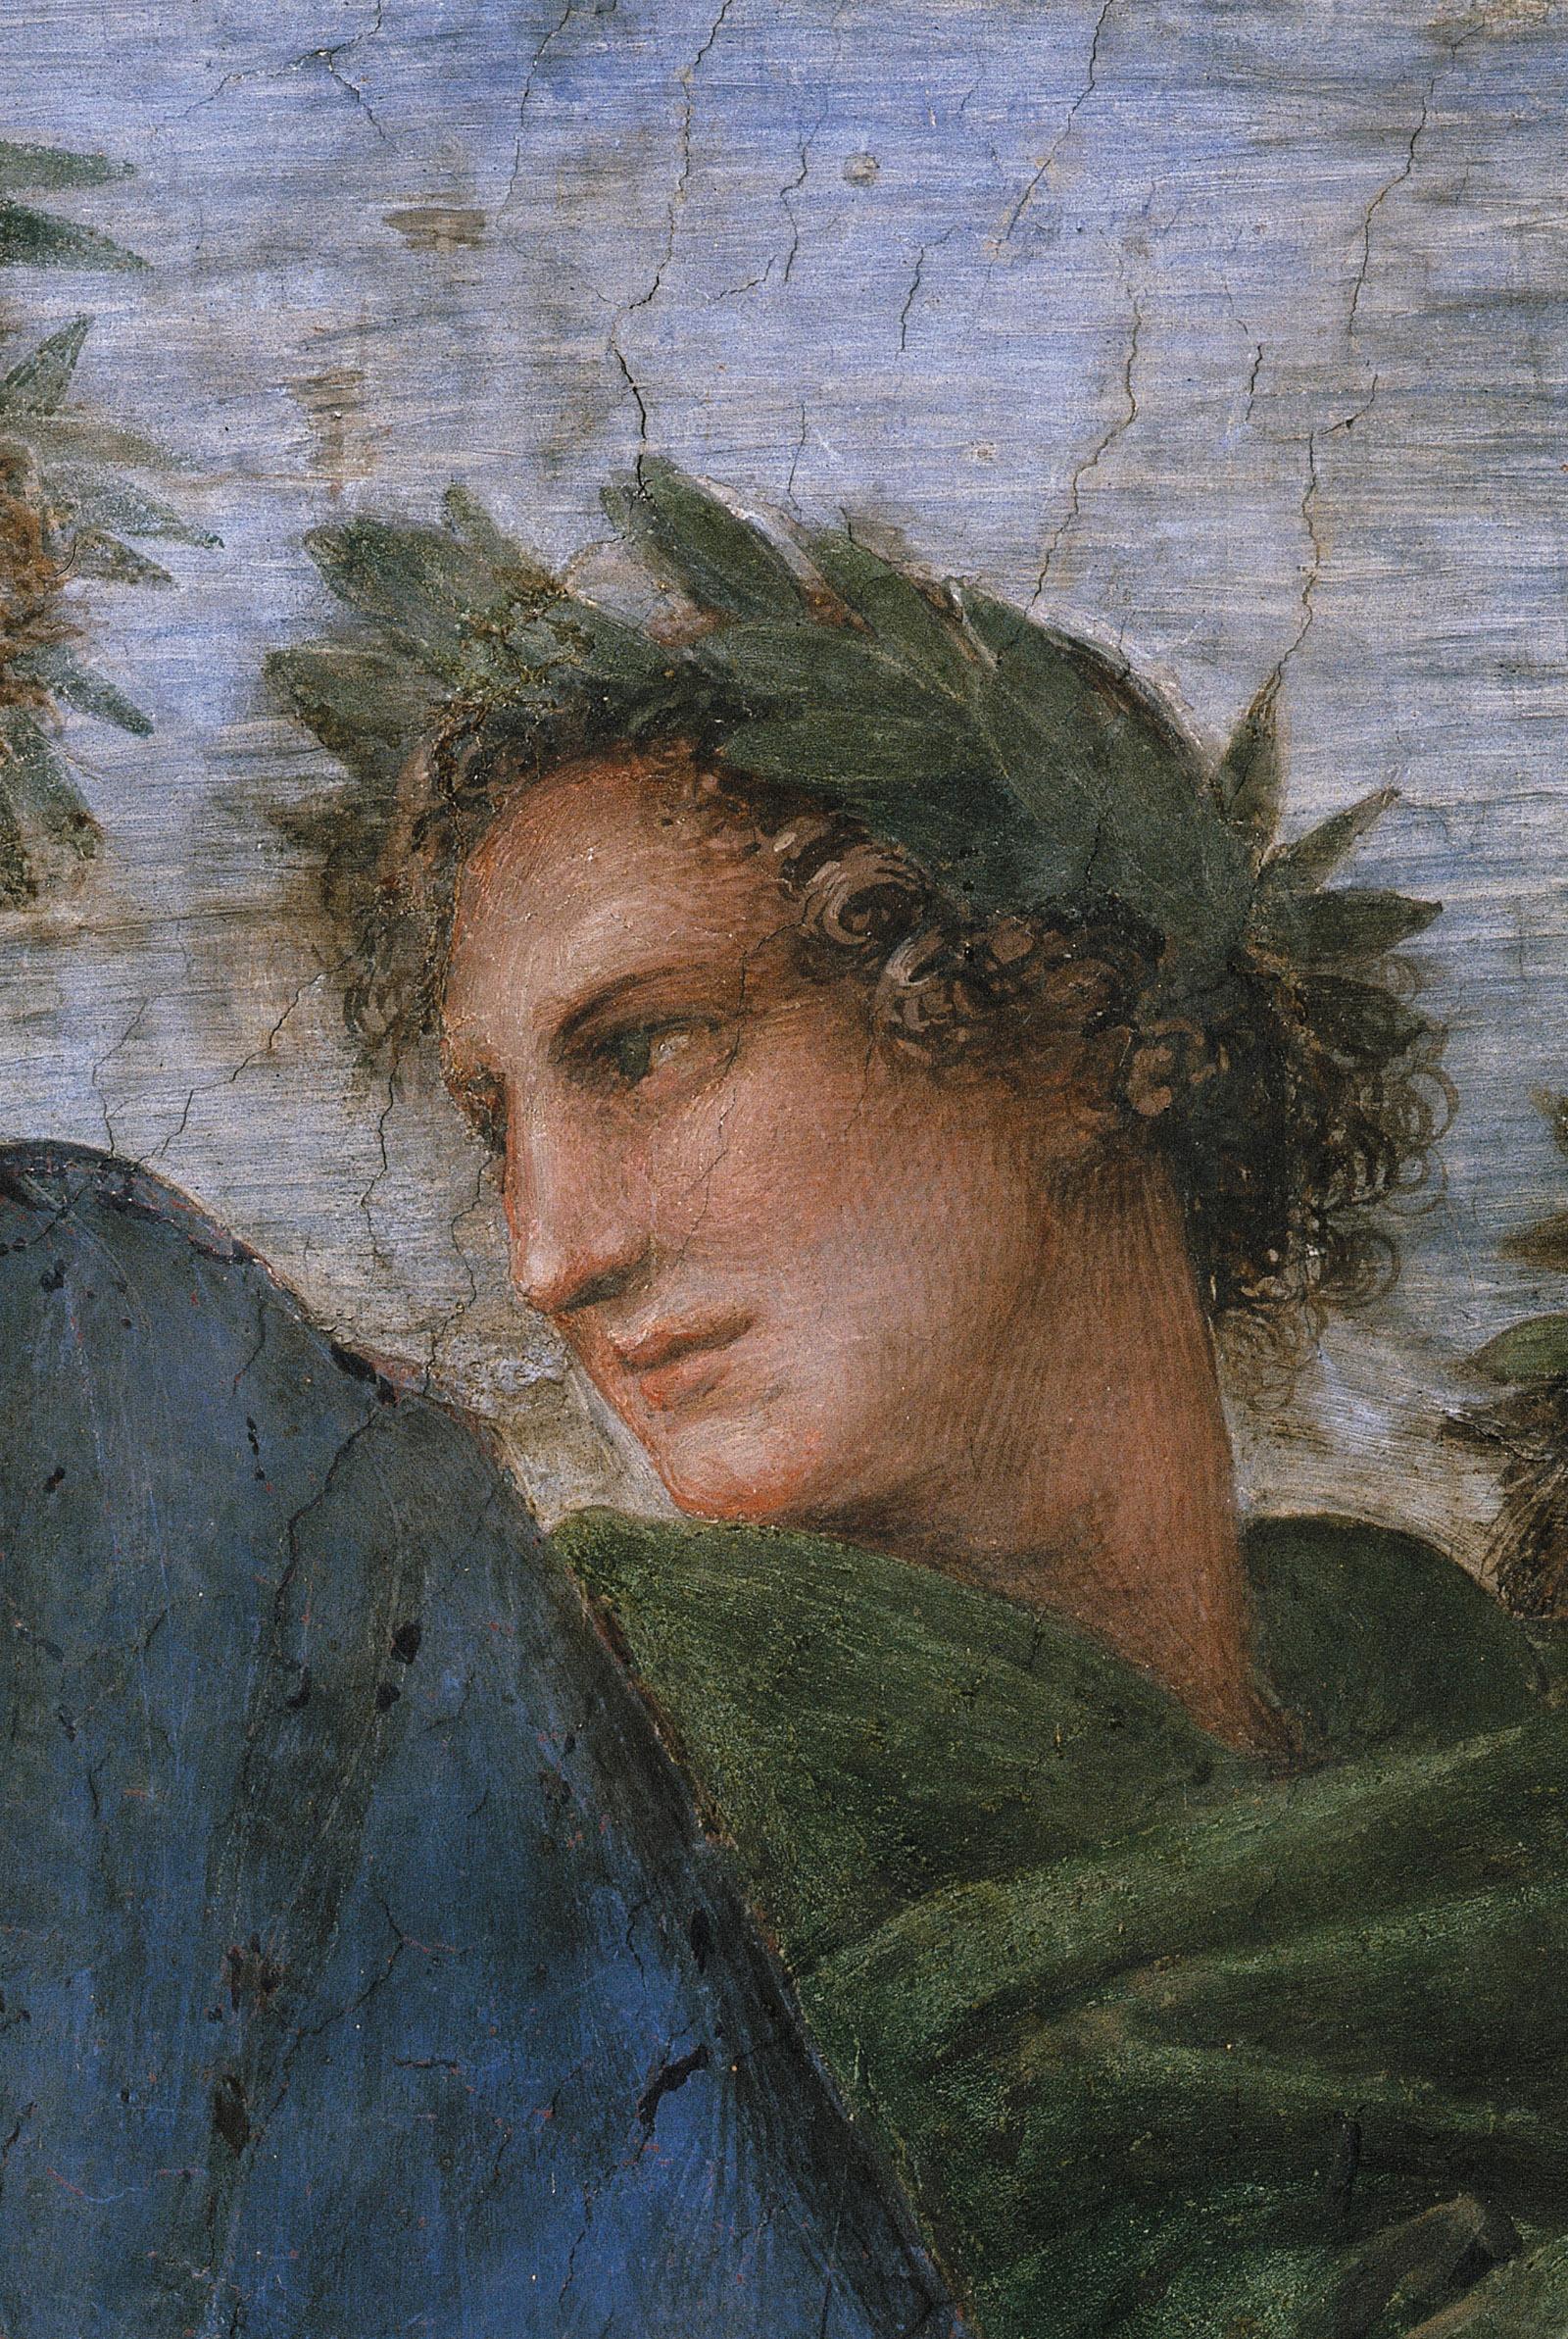 Virgil; detail from Raphael's The Parnassus, circa 1511